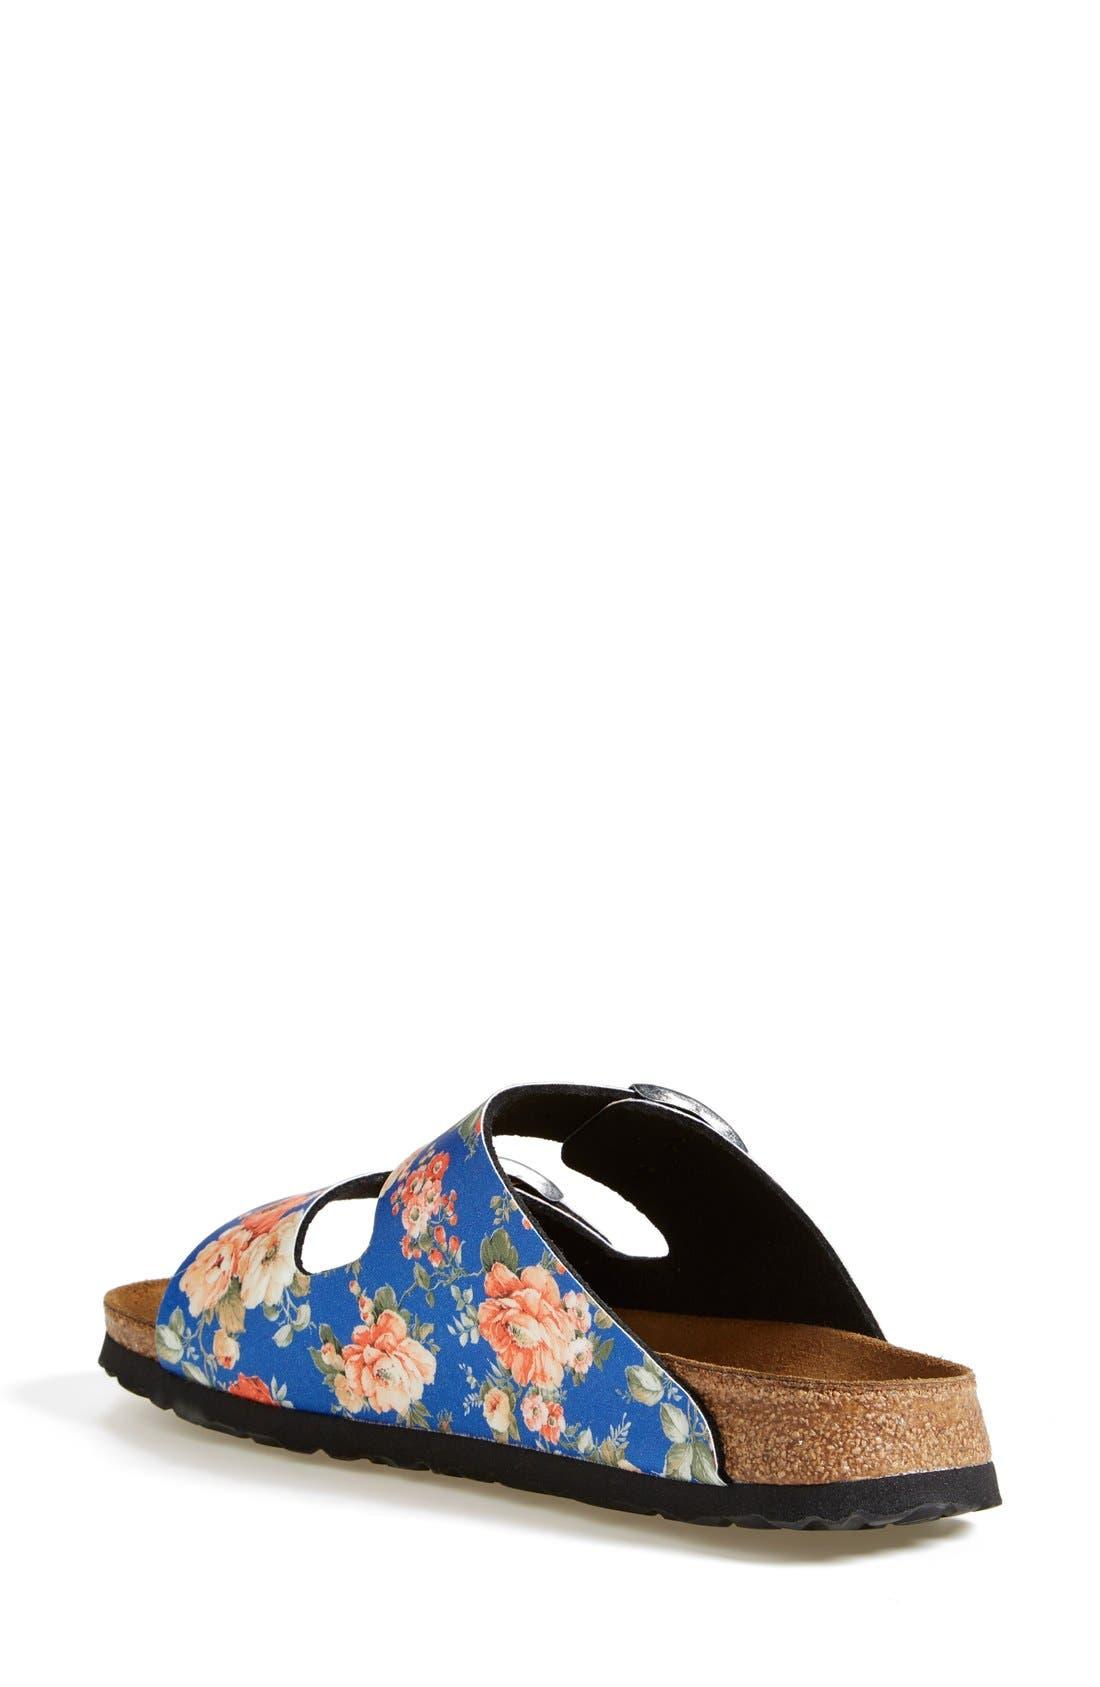 Alternate Image 2  - Birkenstock 'Arizona' Floral Print Sandal (Women)